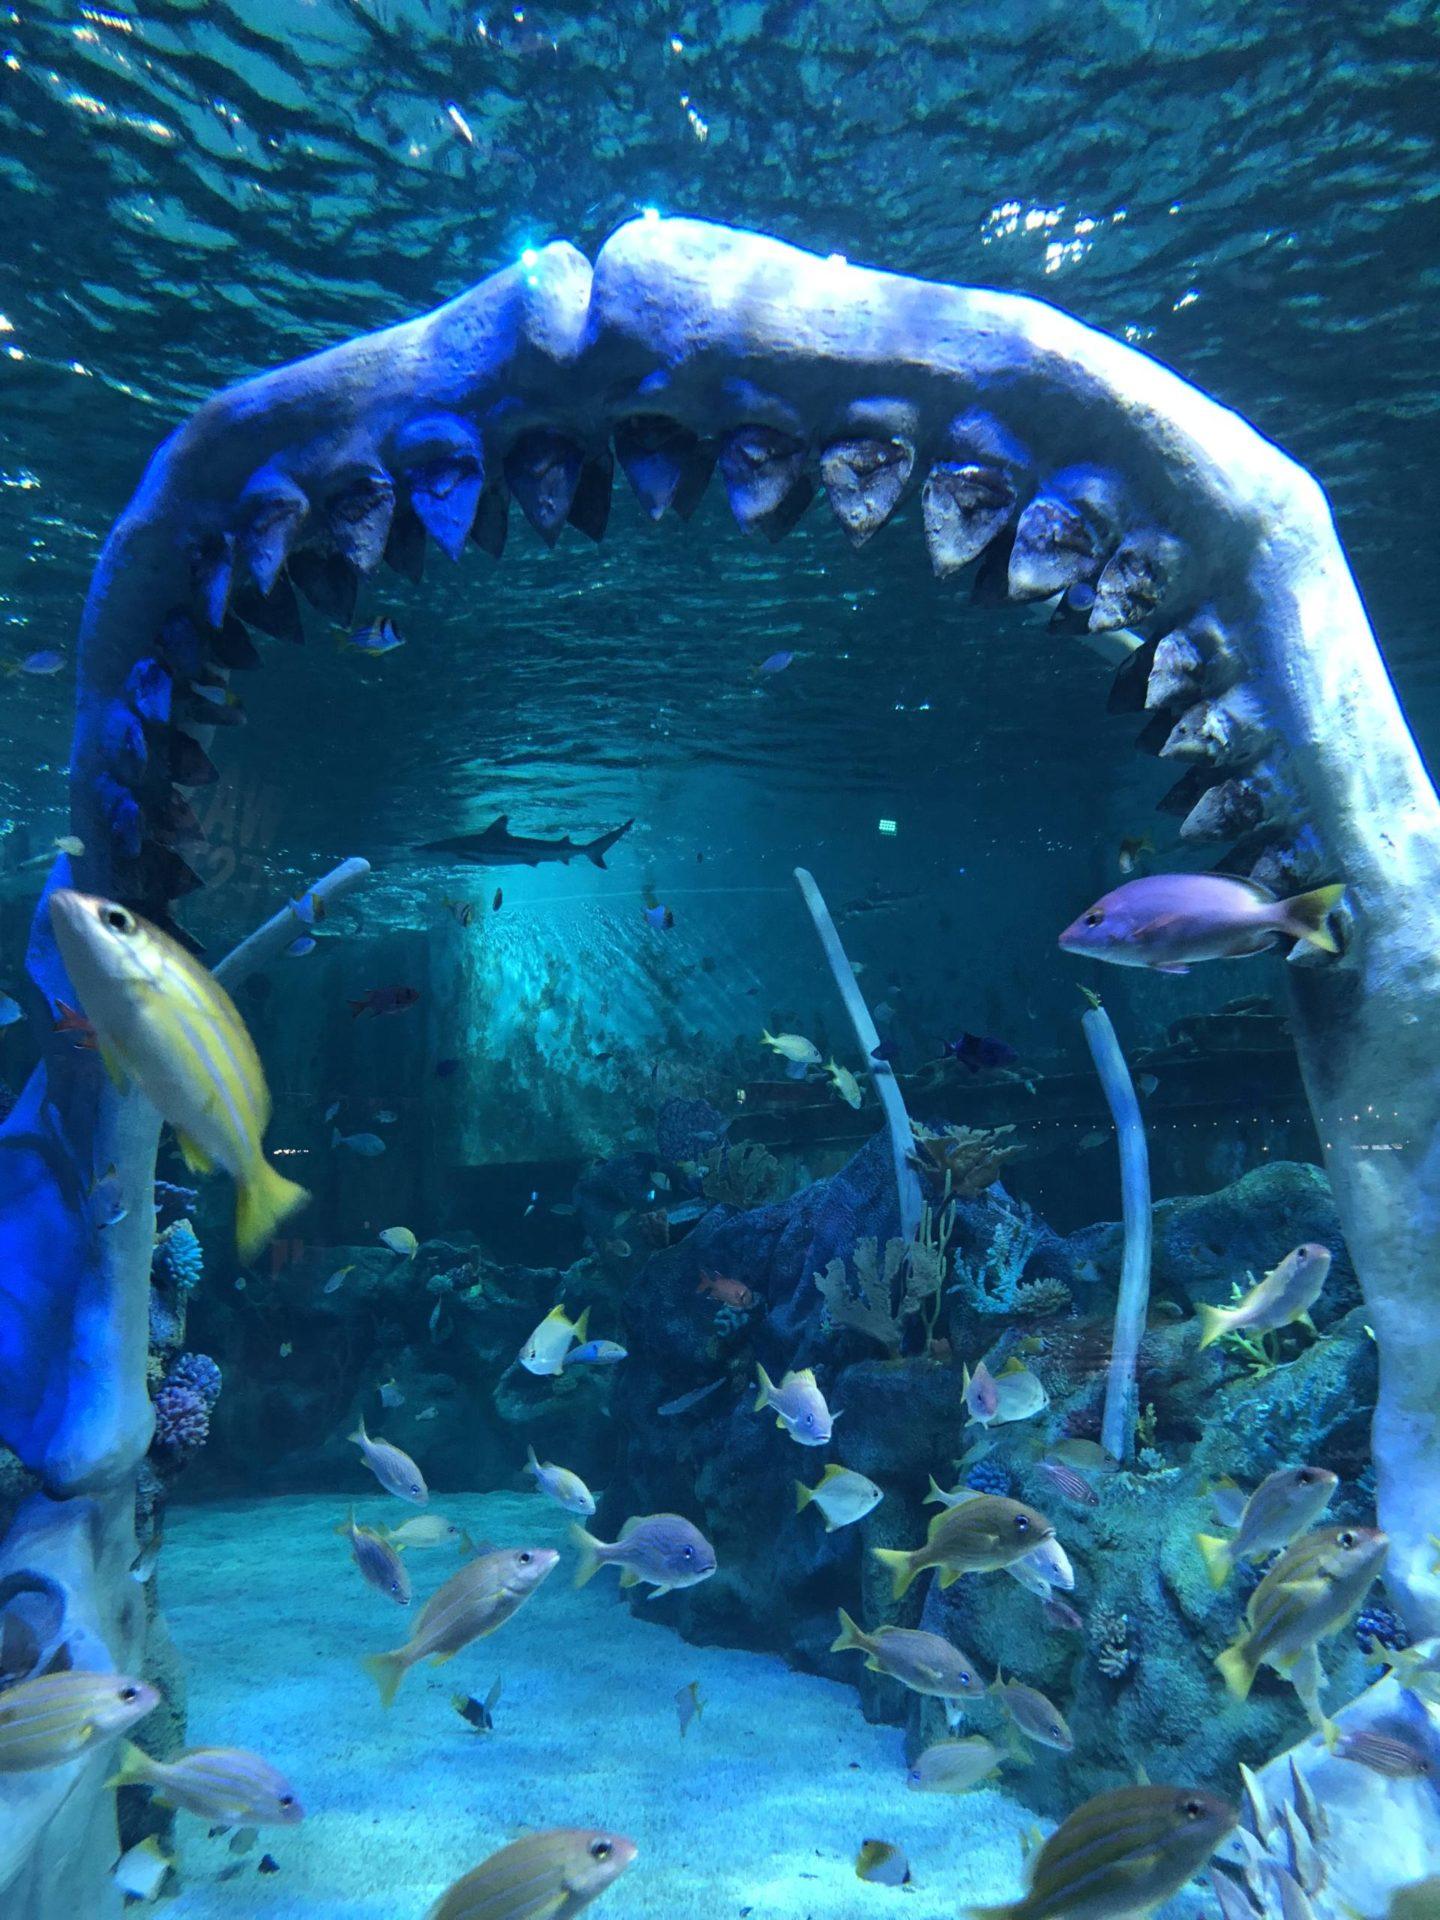 Bear Grylls Adventure Birmingham Dive Jaws